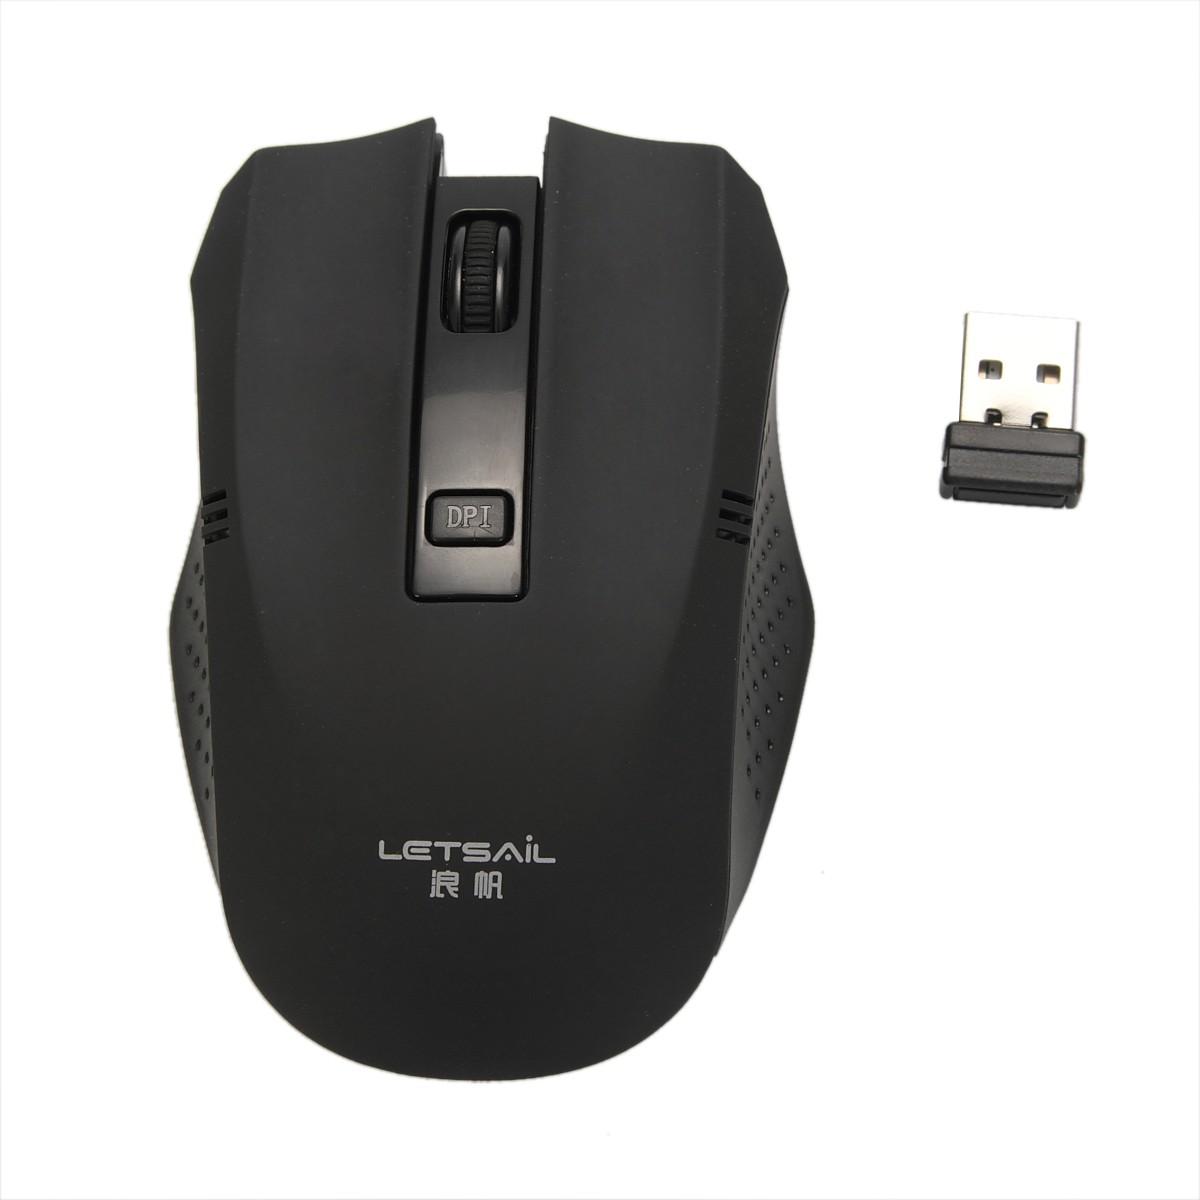 2,usb无线鼠标:将usb接收器插入电脑的usb接口,无线鼠标开启并自动